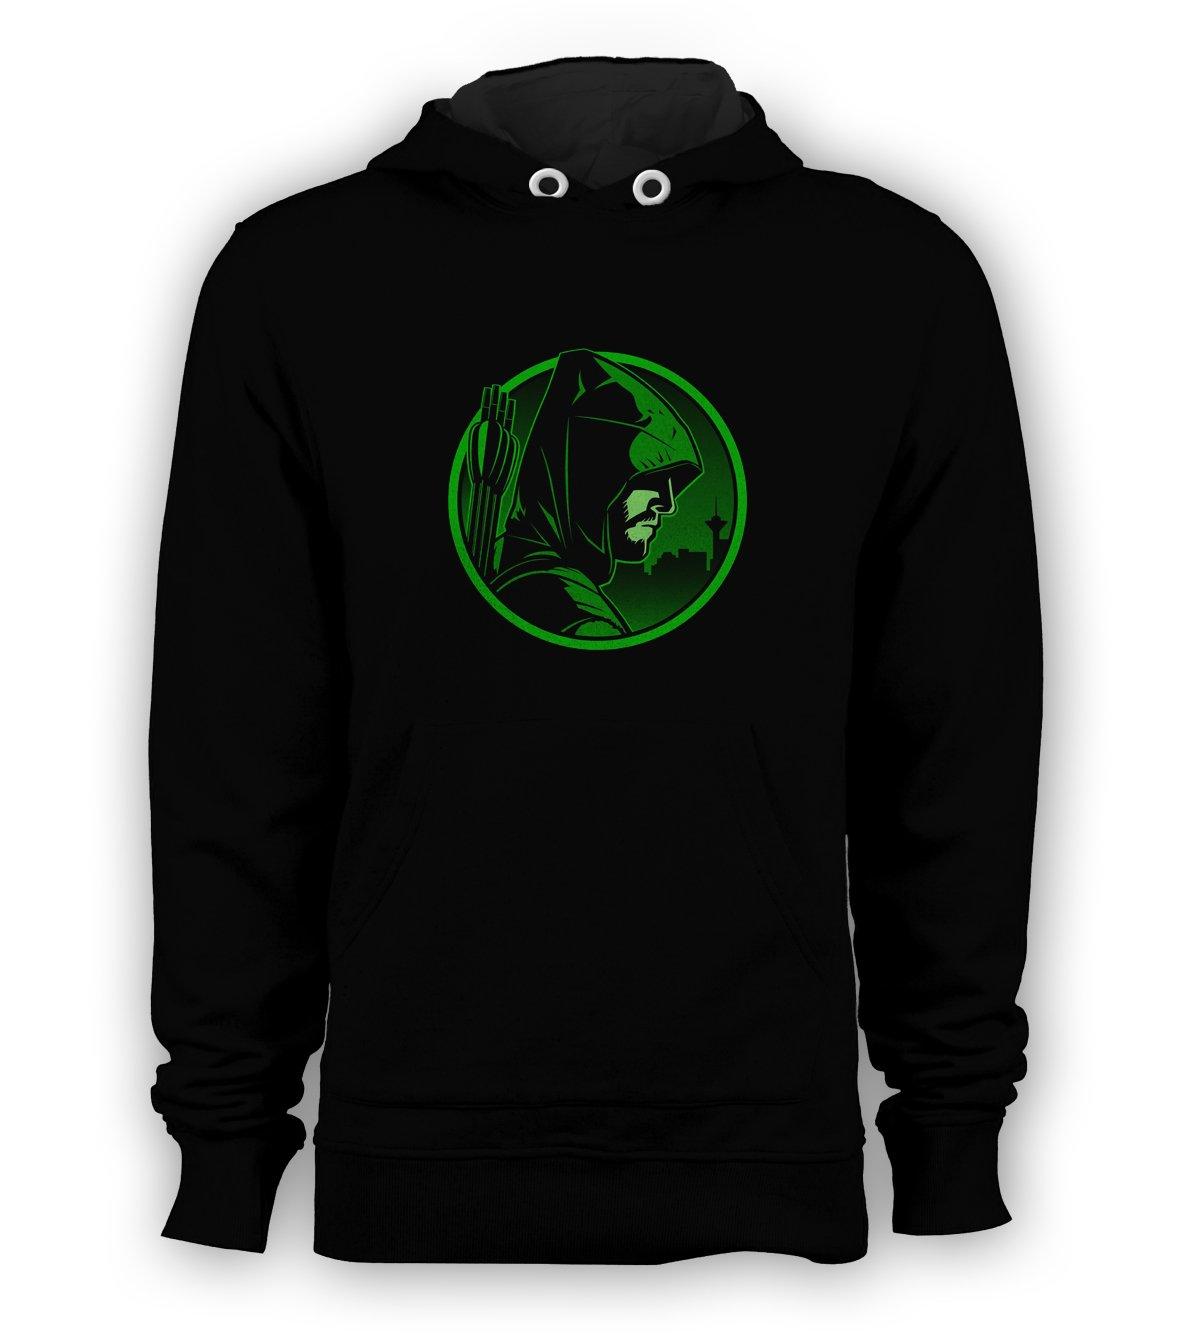 Green Arrow Movie DC Comic Pullover Hoodie Men Sweatshirts Size S to 3XL New Black